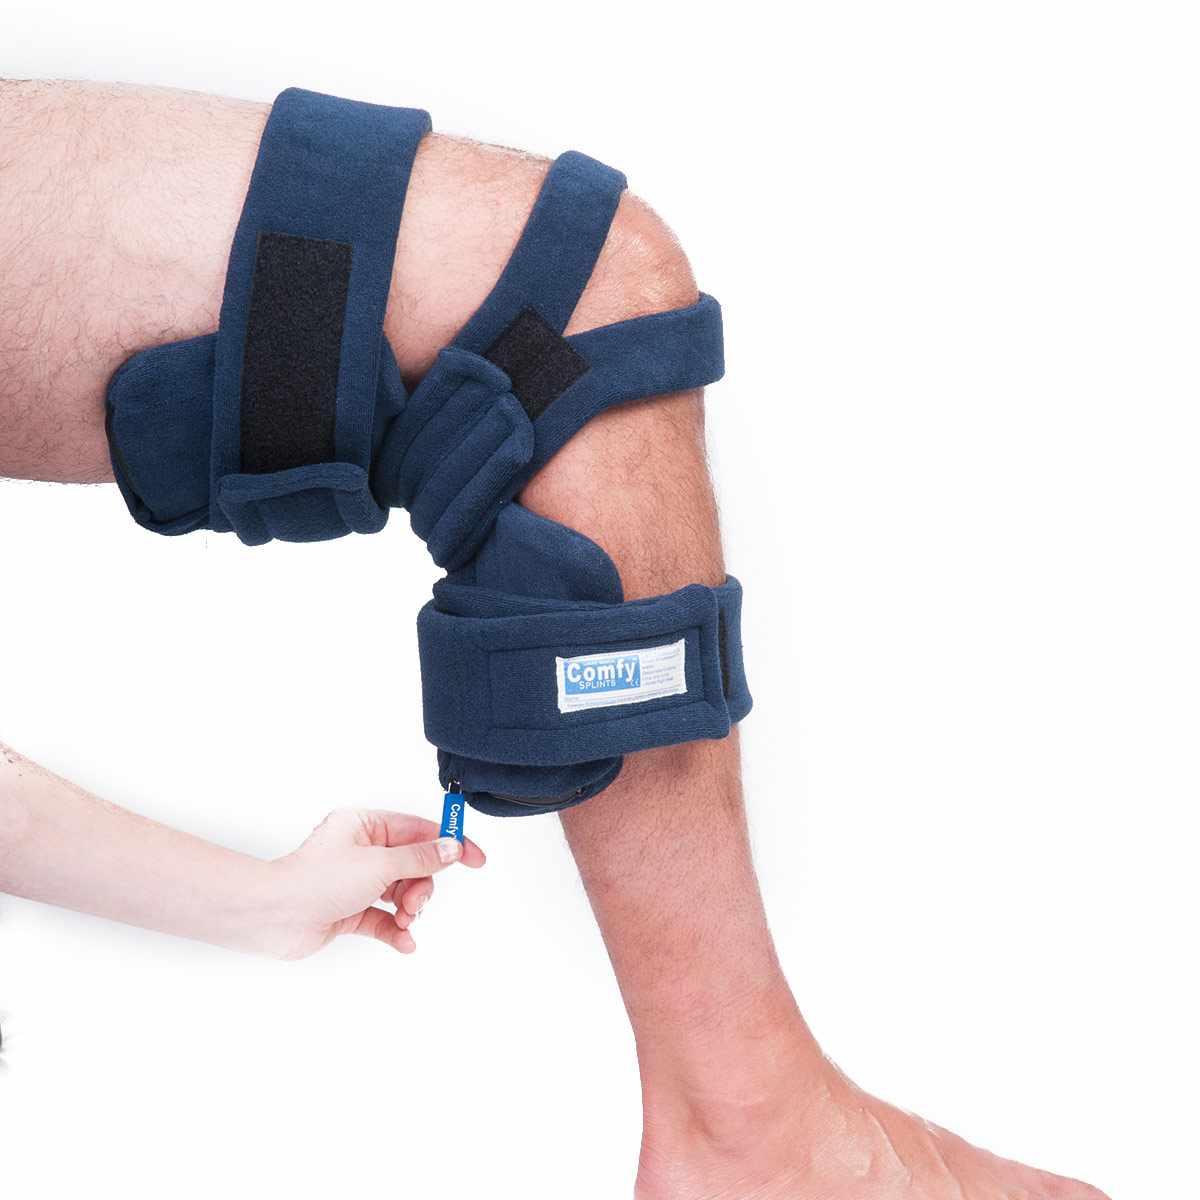 Comfy Locking Knee Orthosis